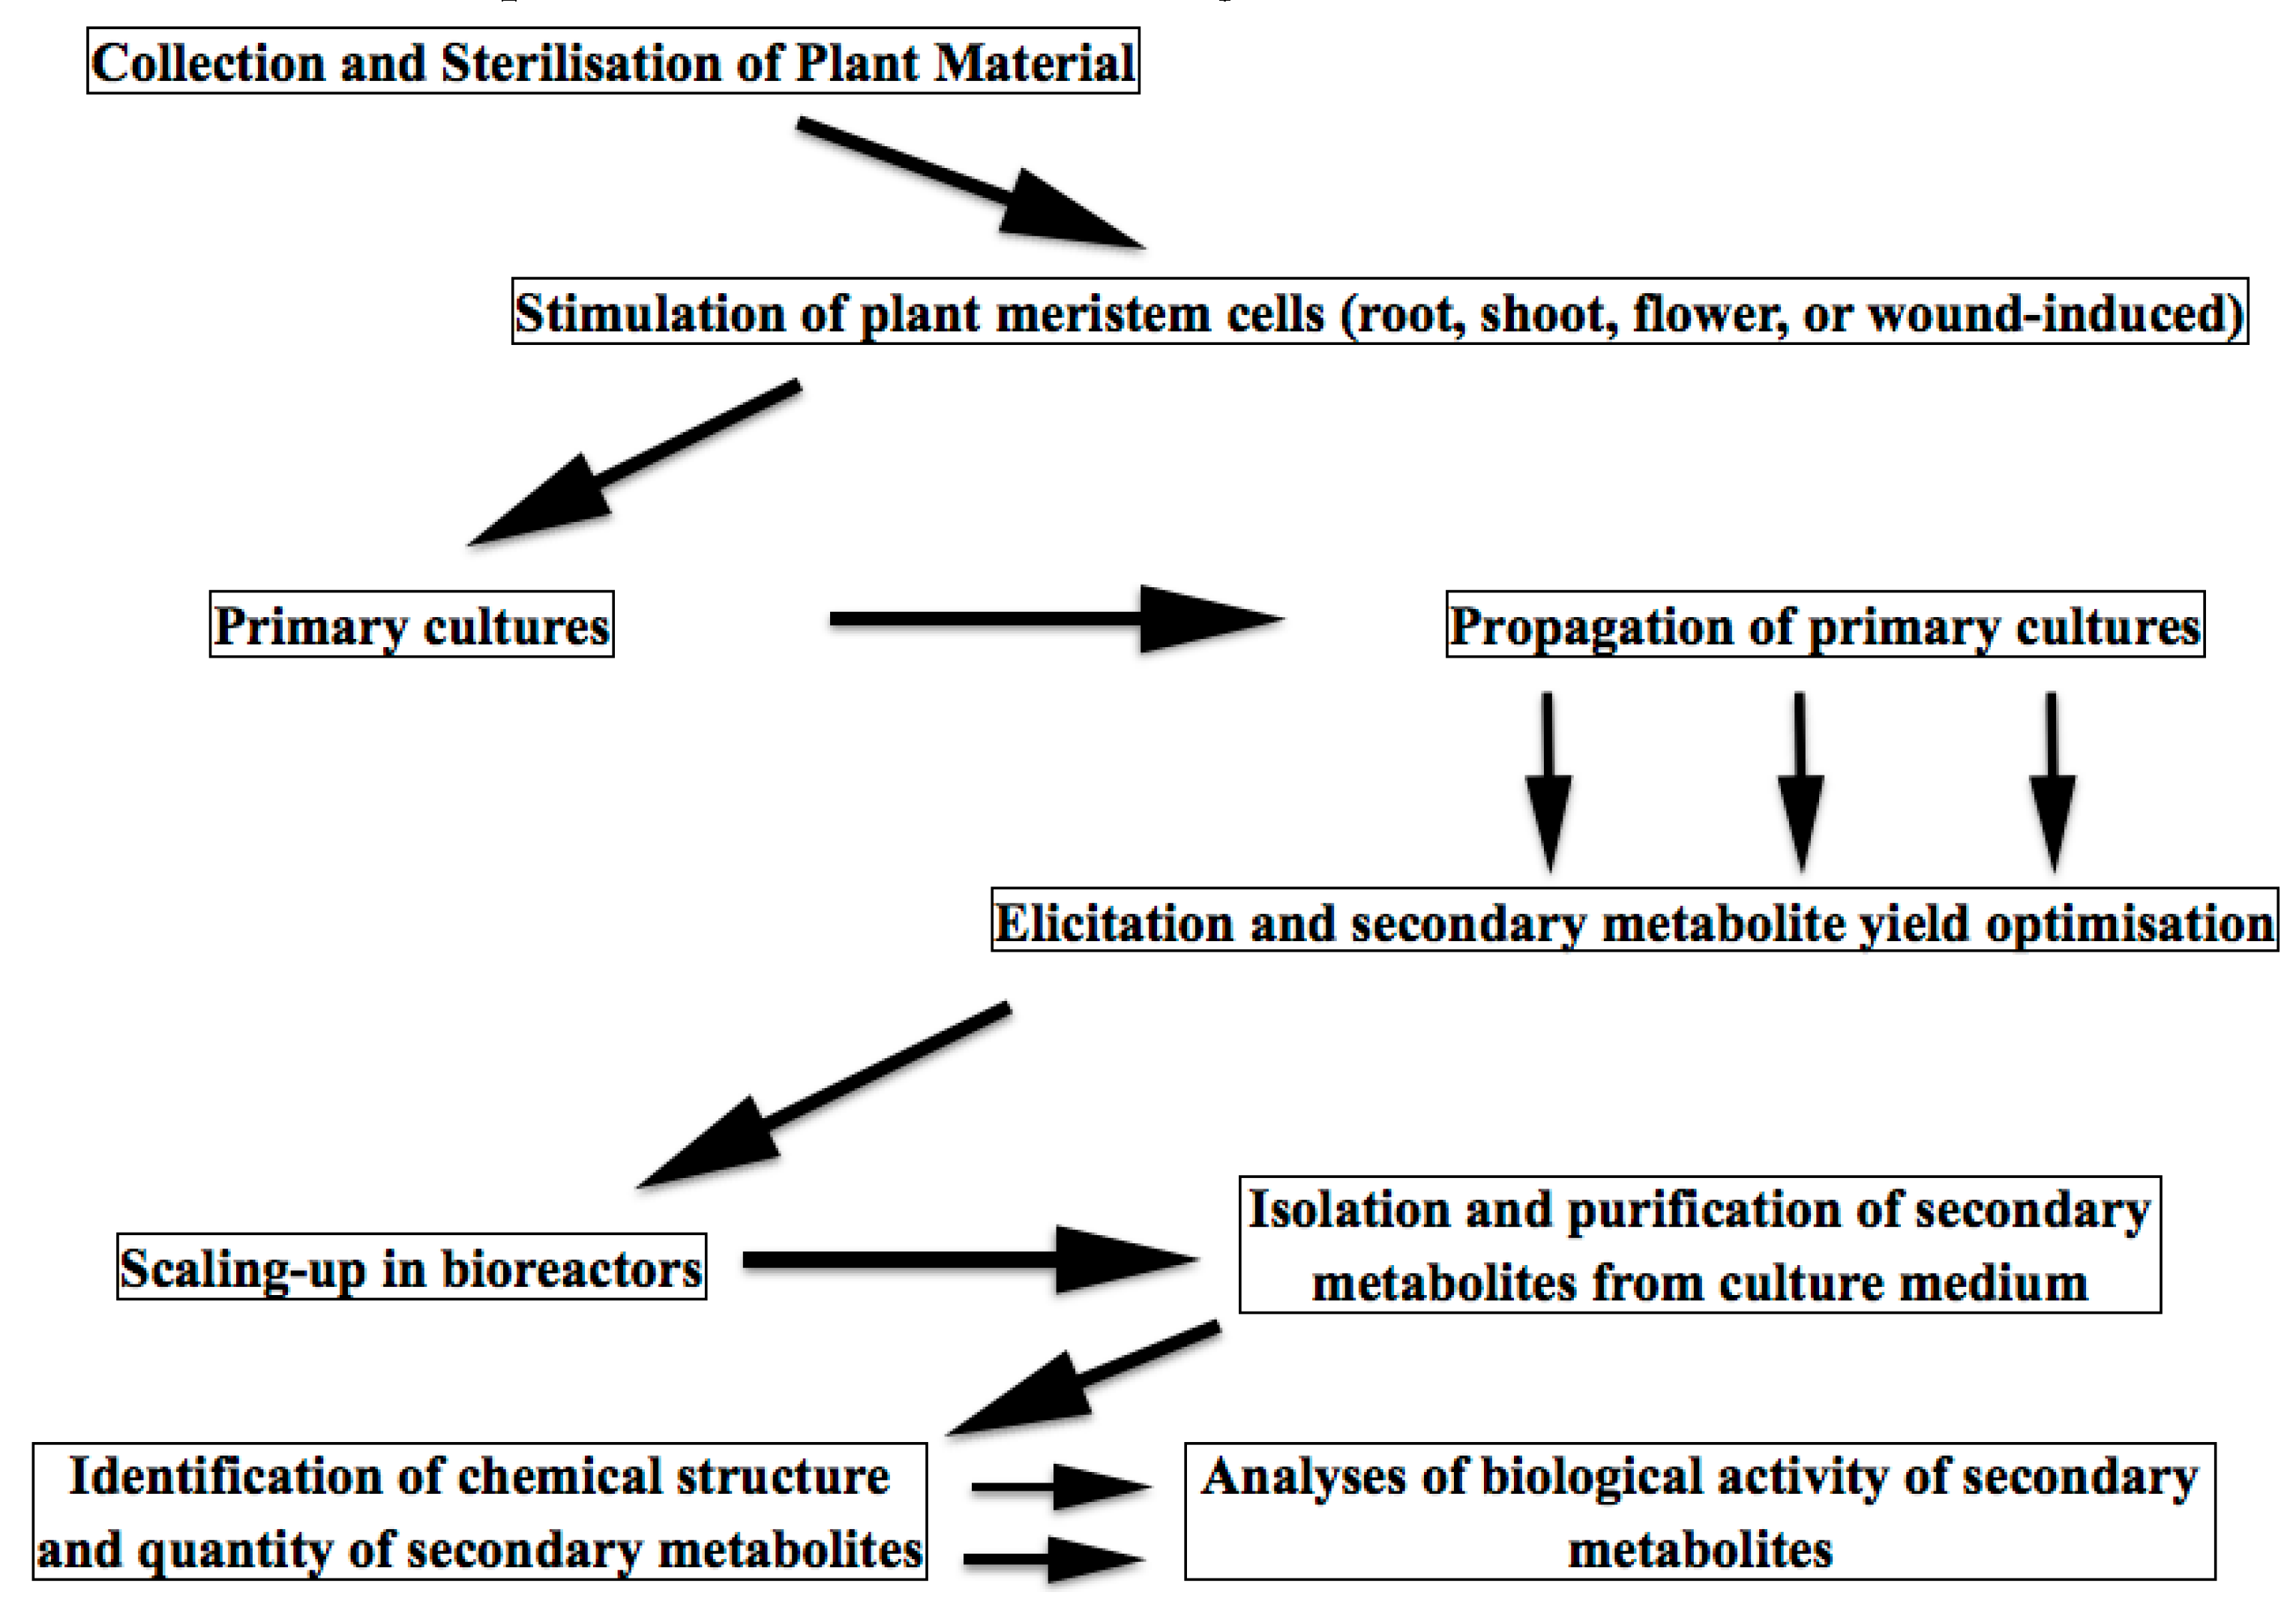 Biomolecules Free Full Text Meristem Plant Cells As A Ultimate Nutrition Un Amino 2002 330 Caps Original Singlet 07 00040 G003